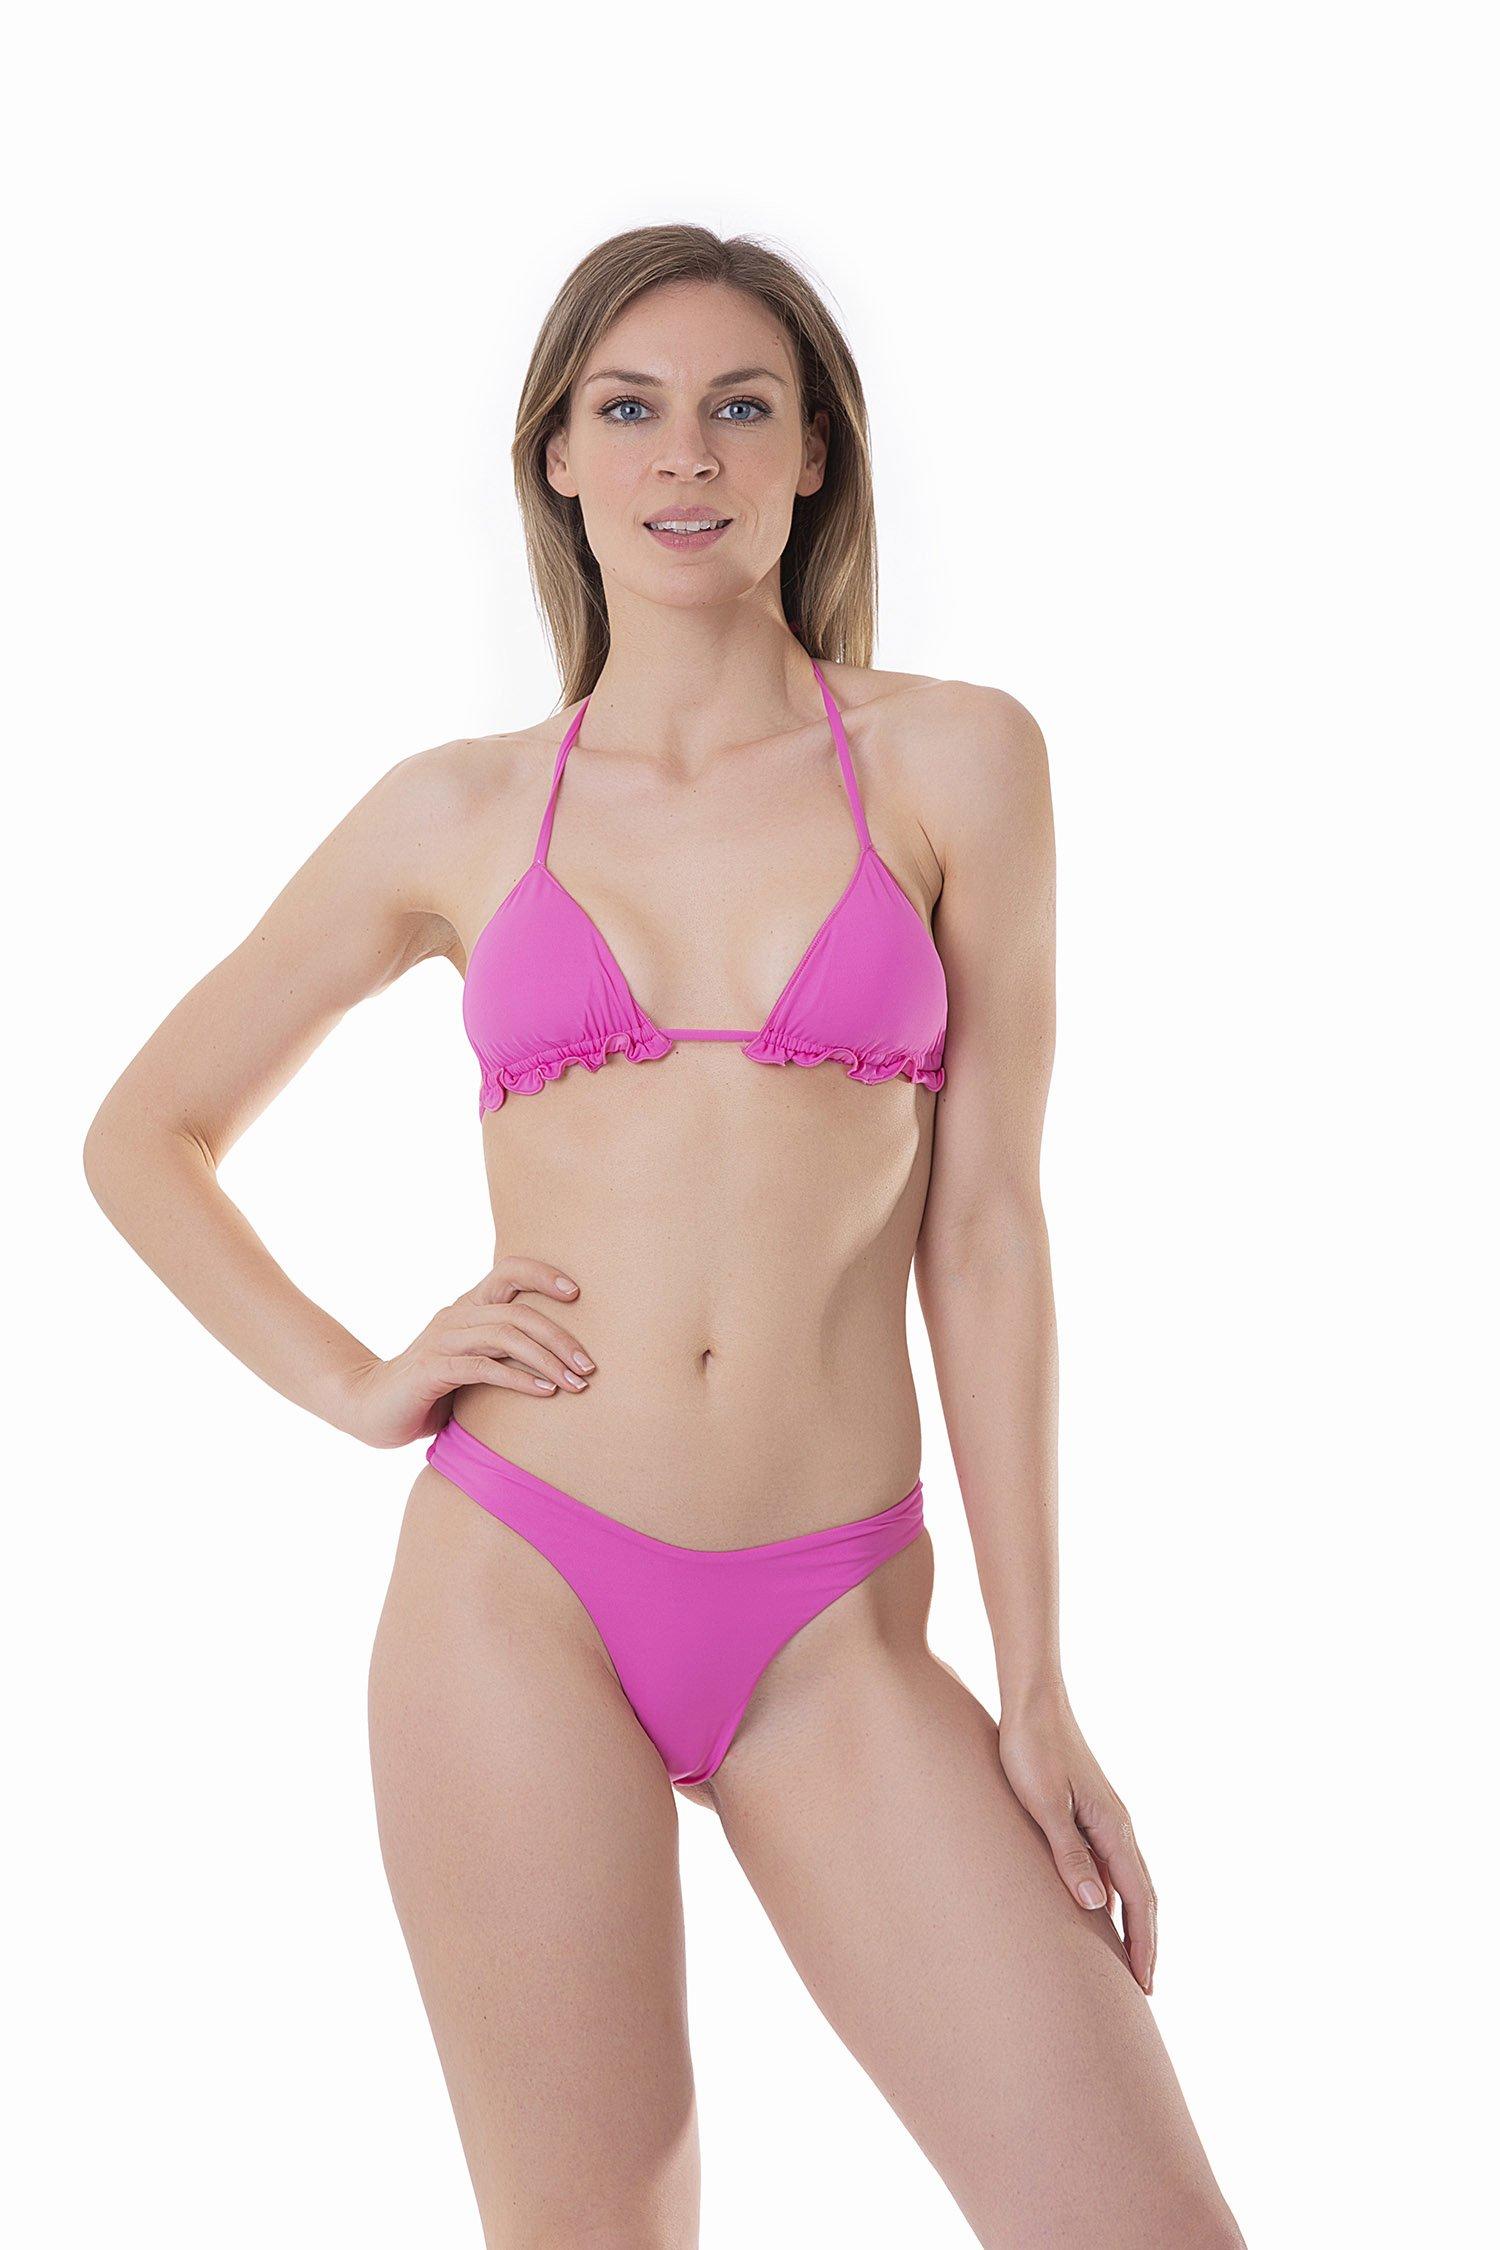 BASIC TRIANGLE TOP HIGH-LEG BOTTOM SOLID COLOUR - Rosa Camelia 355